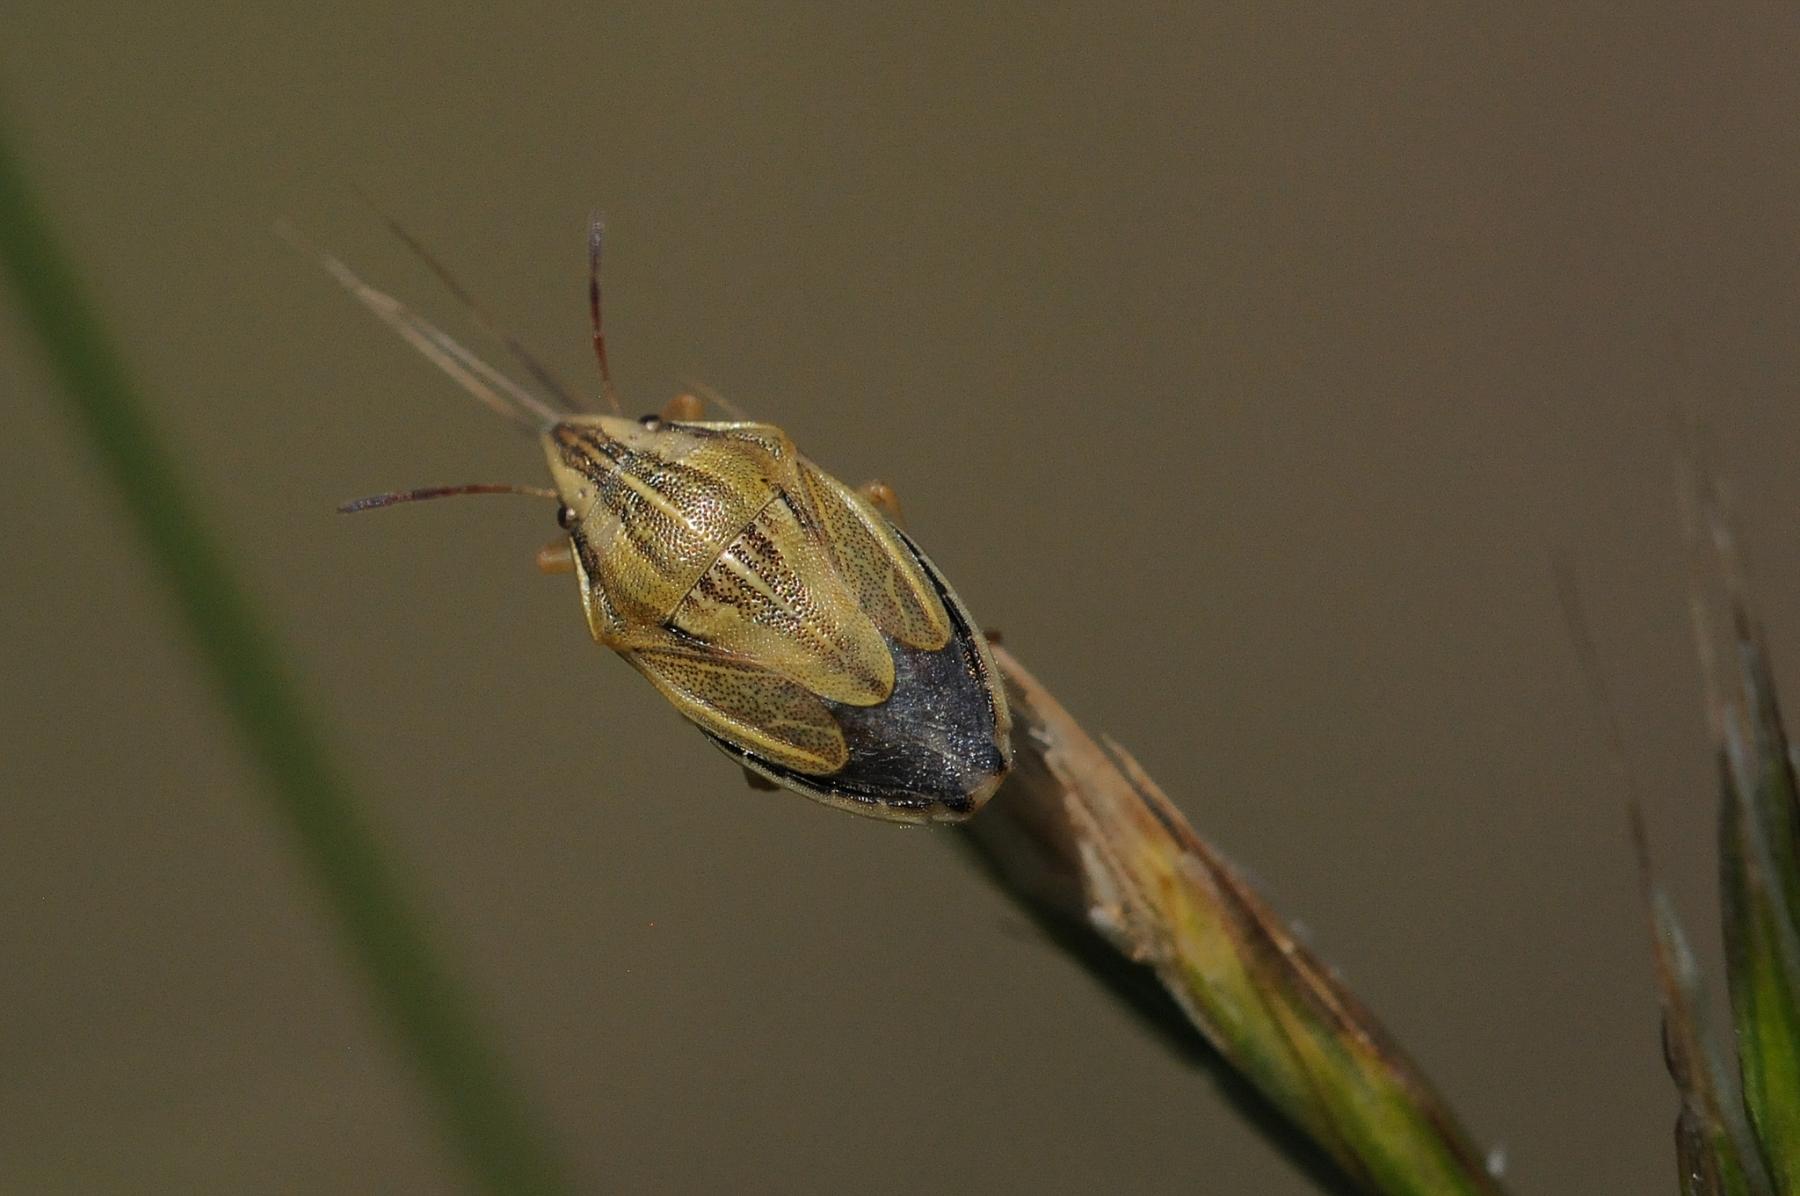 Bishop's Mitre Shieldbug - Aelia acuminata, Anston Stones.